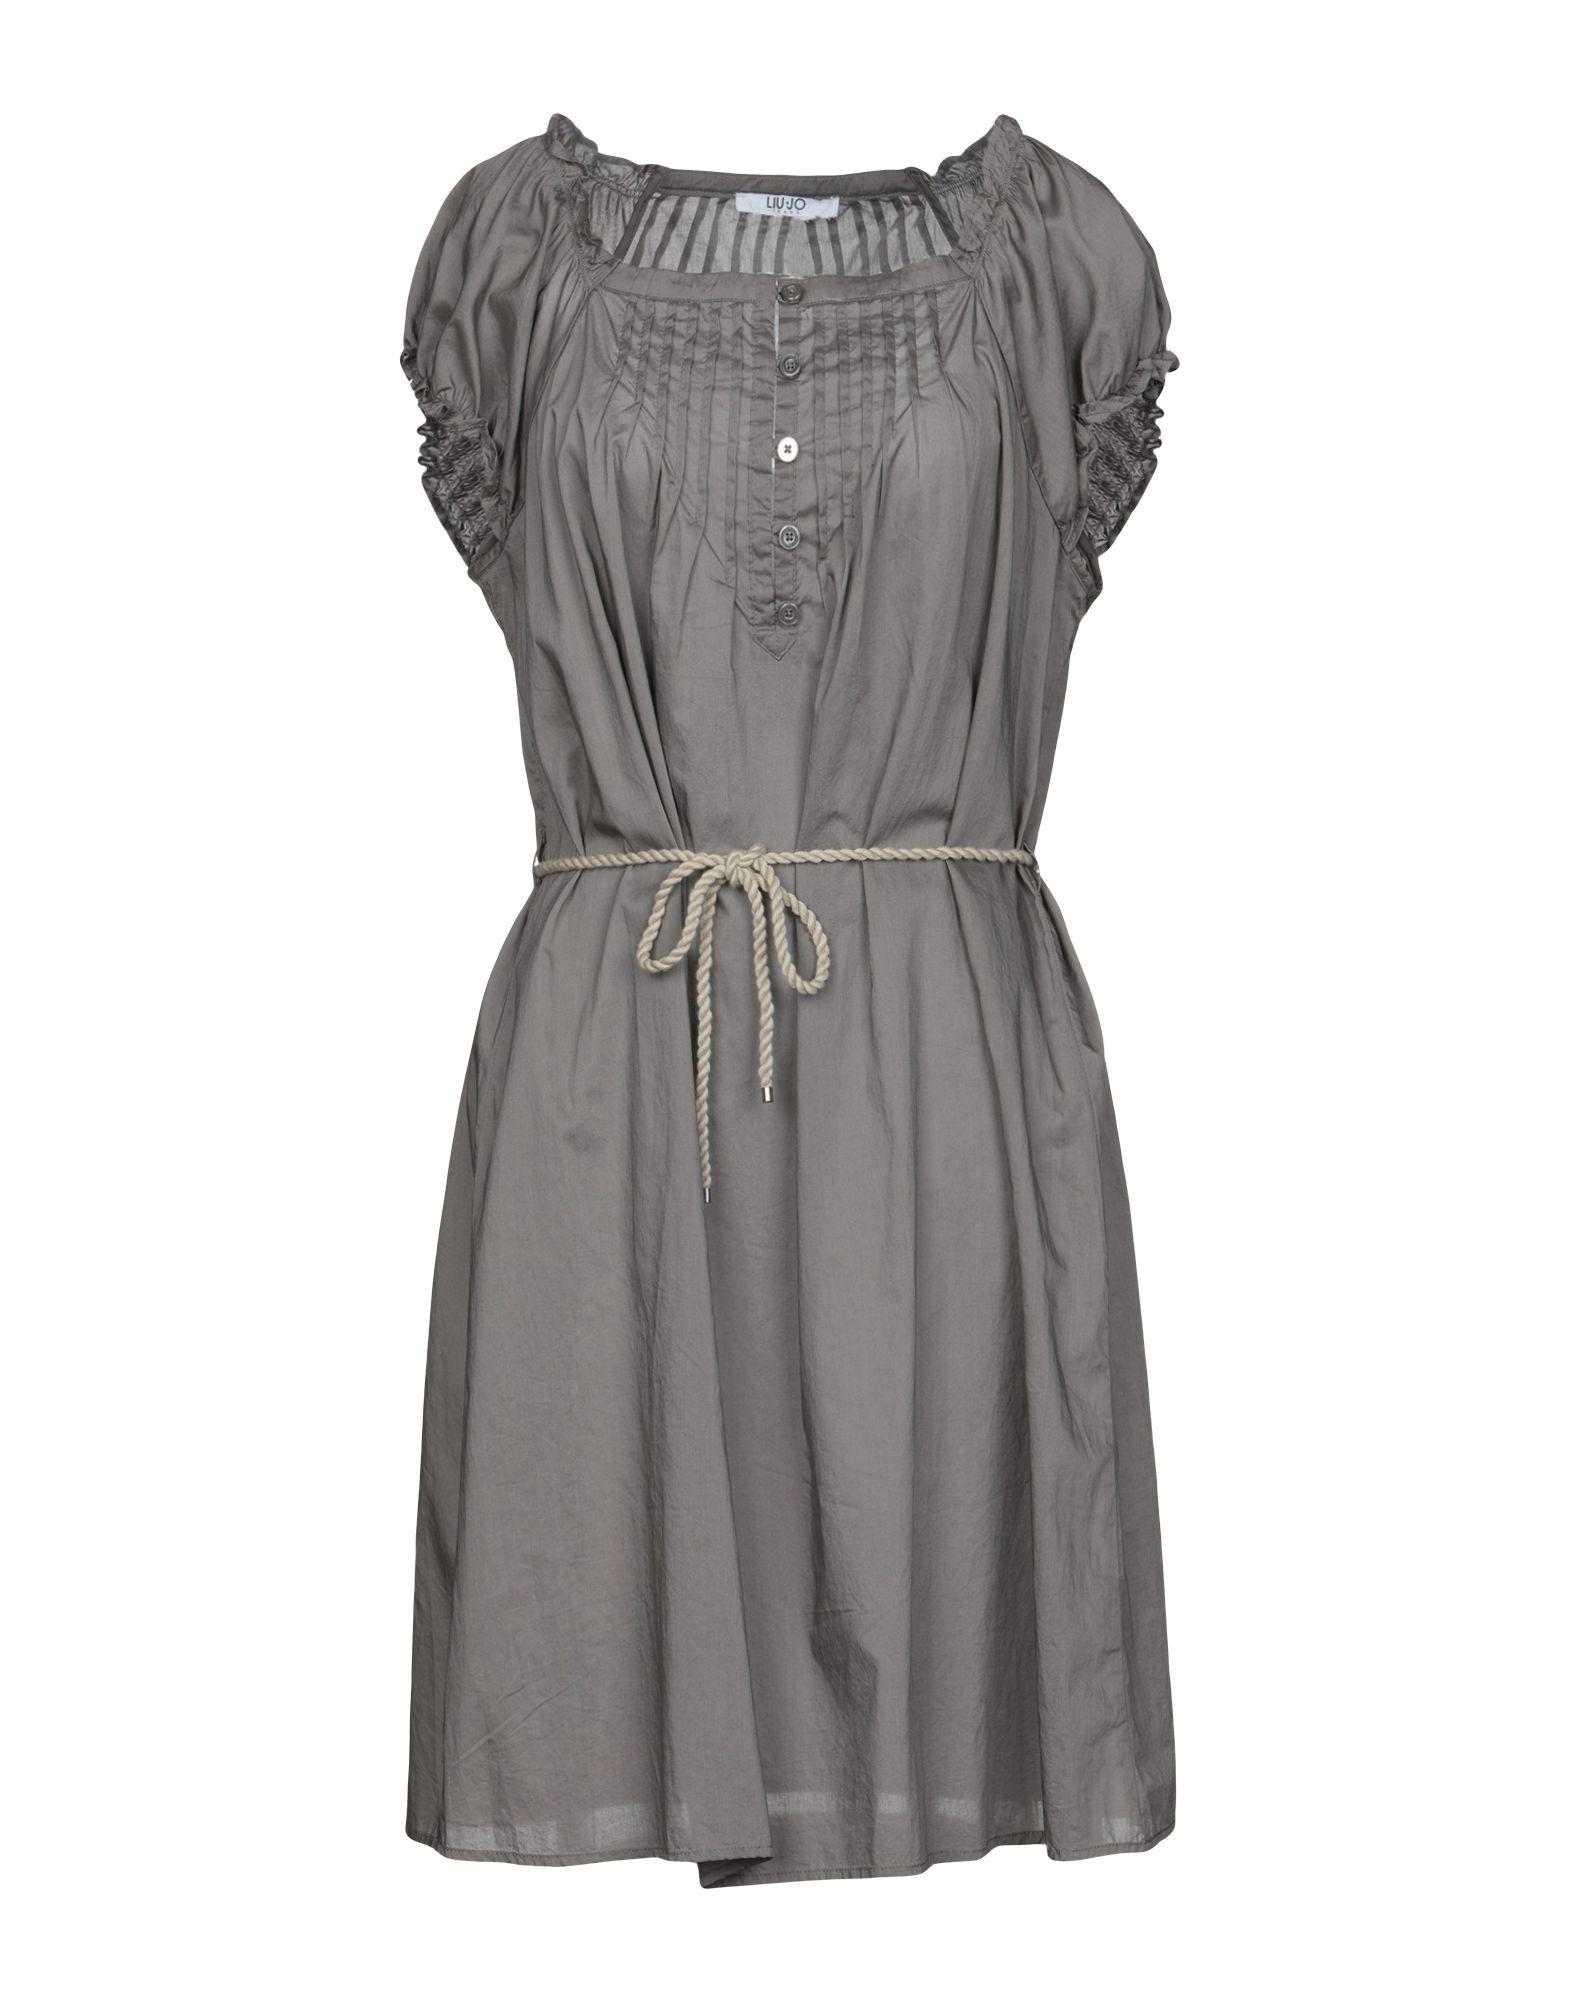 LIU •JO Короткое платье платье jo elle платья и сарафаны мини короткие